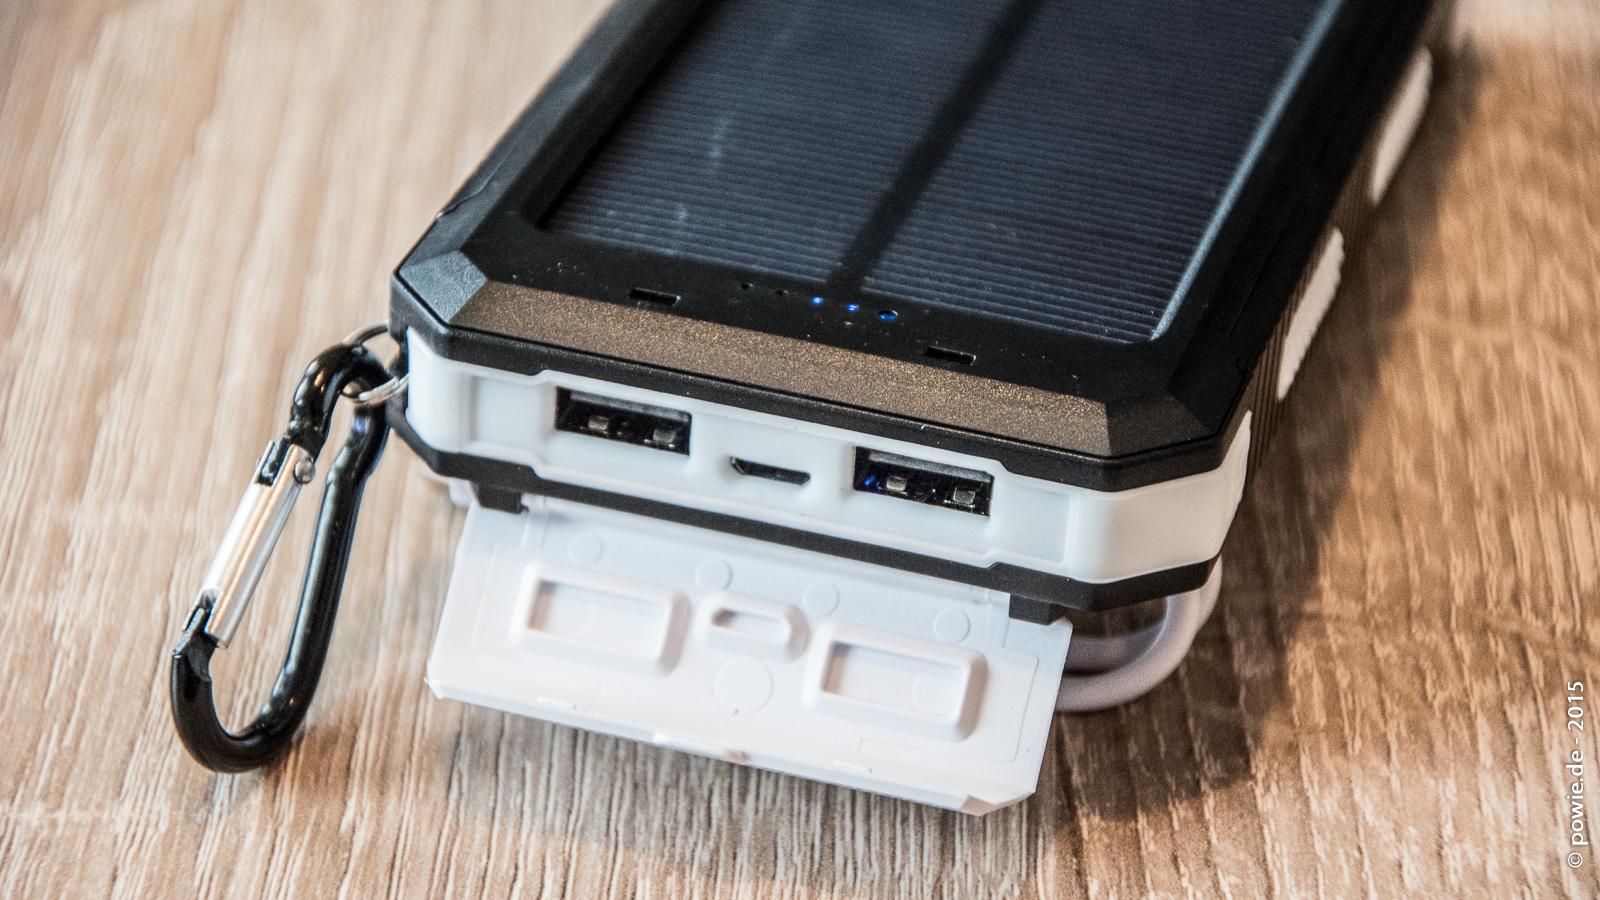 hrde-powerbank-solar-3